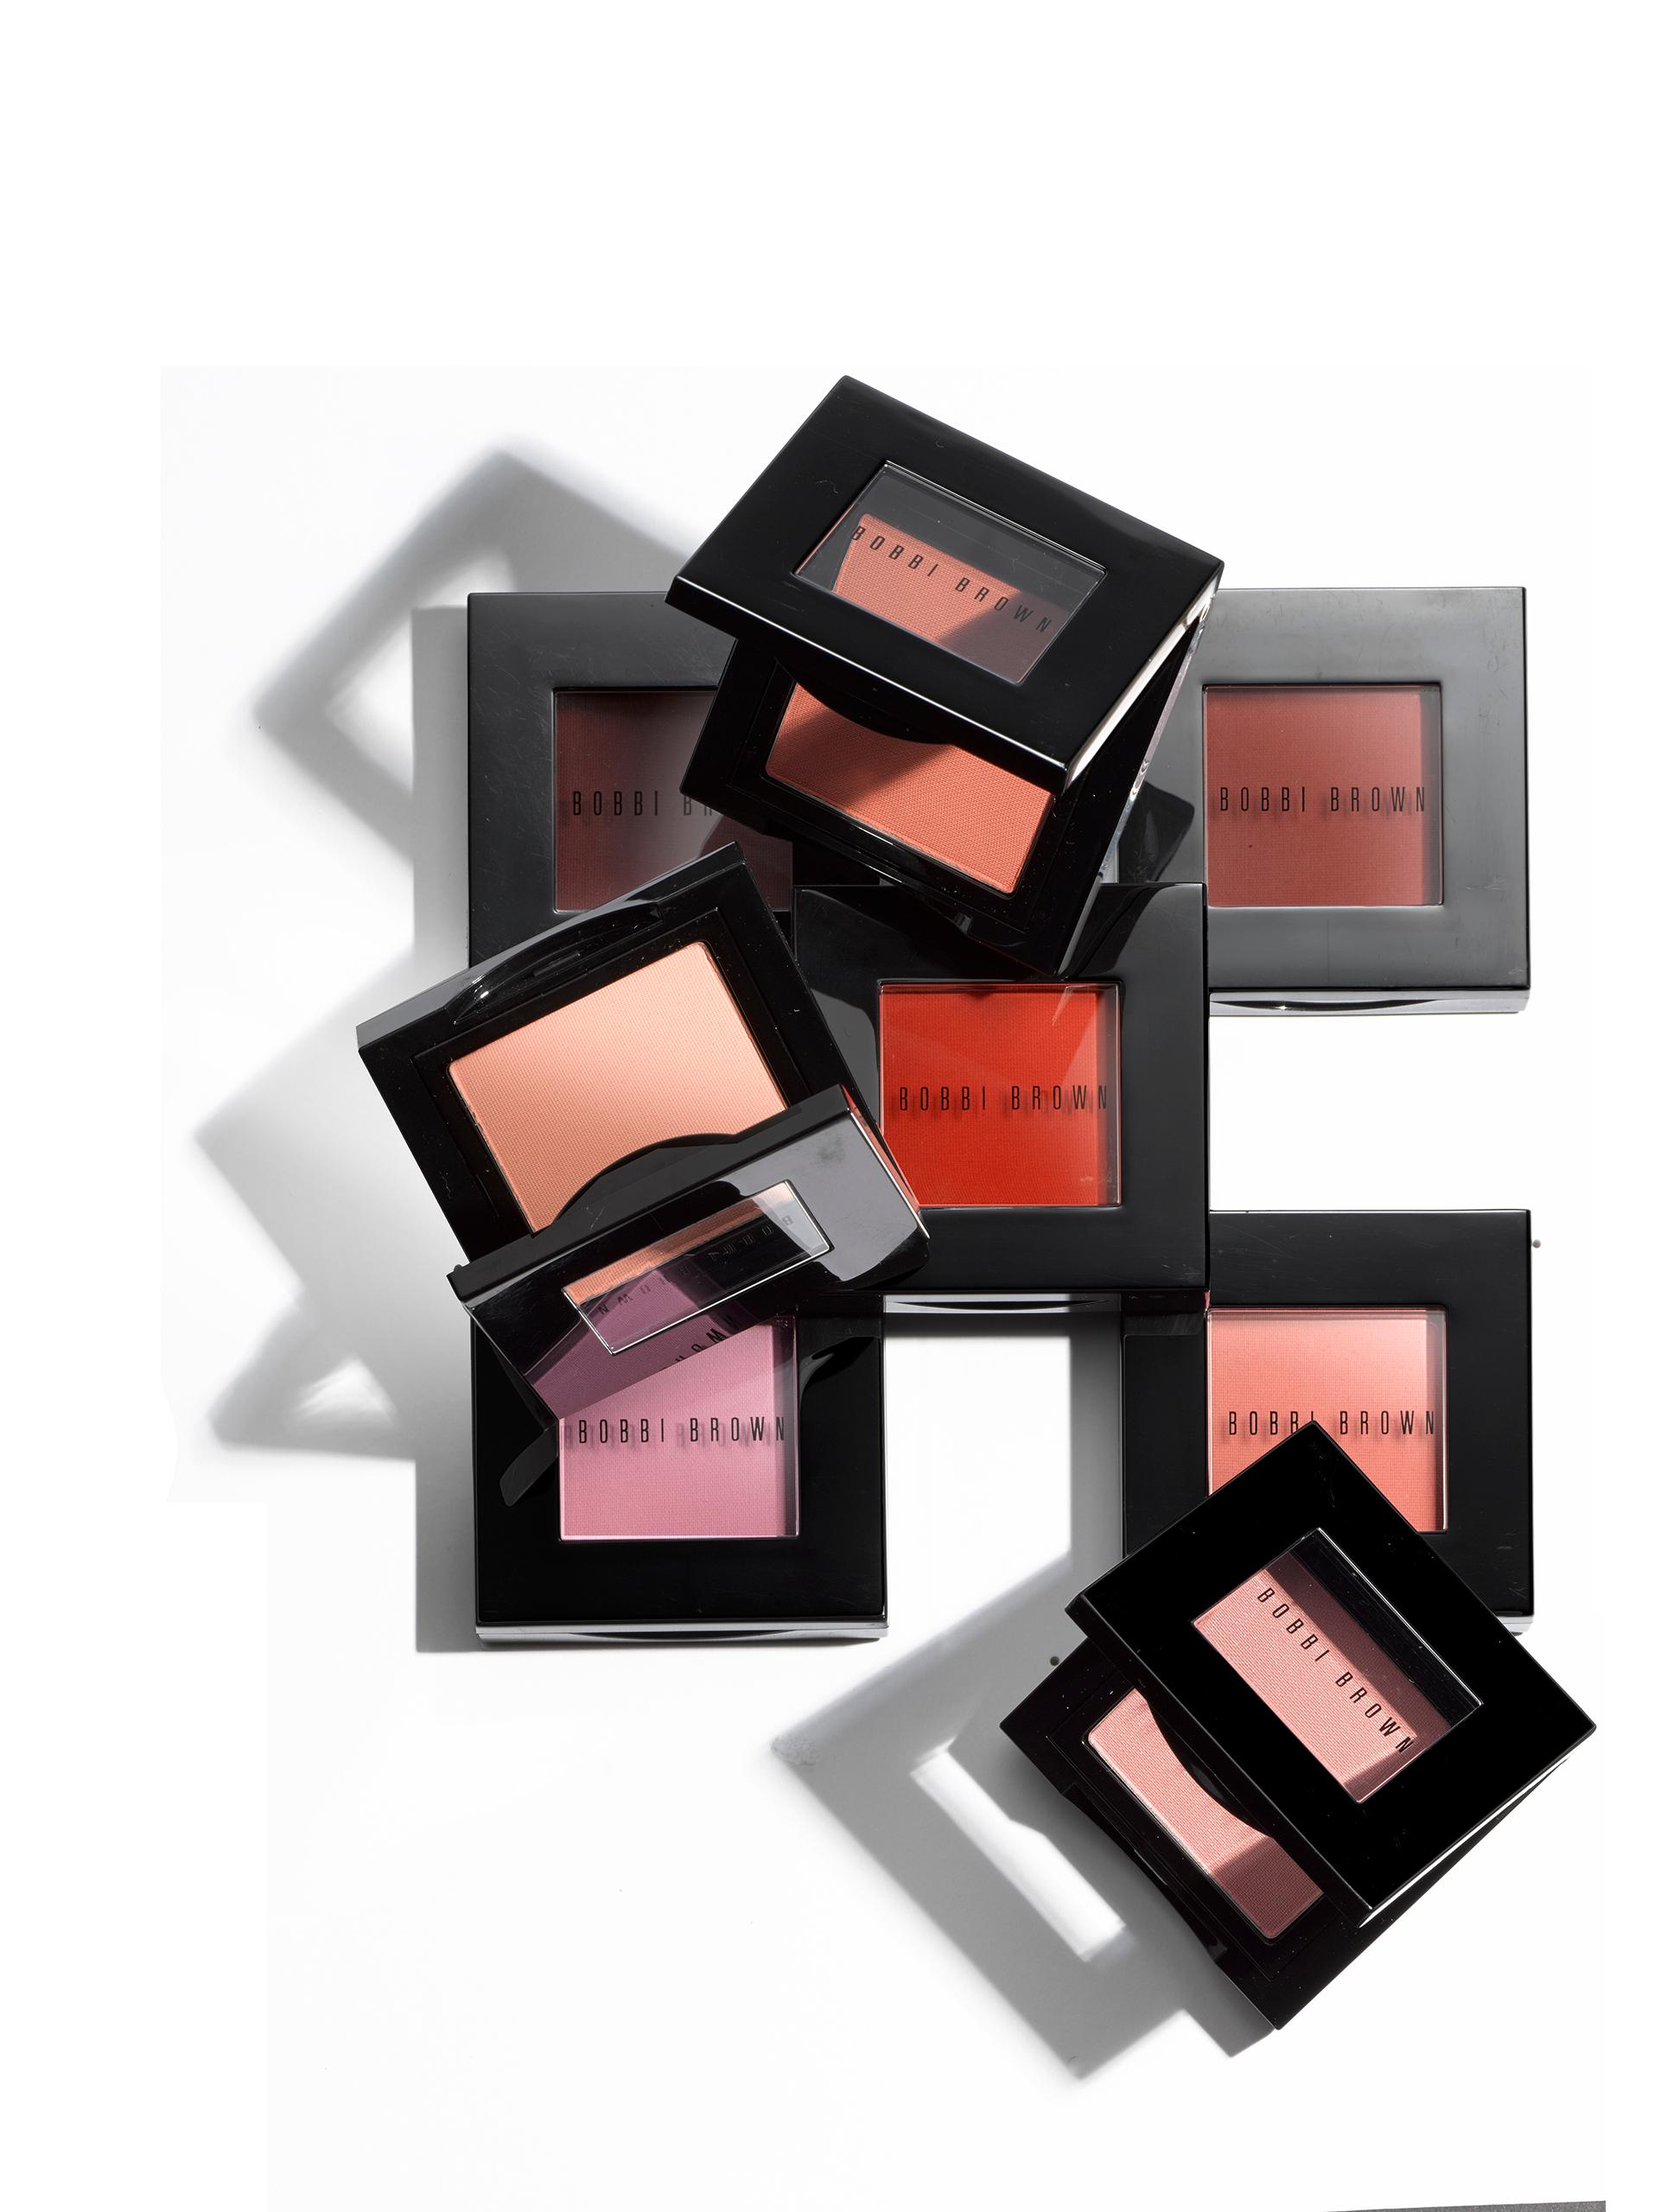 Bobby Brown Cosmetics Advertising Image